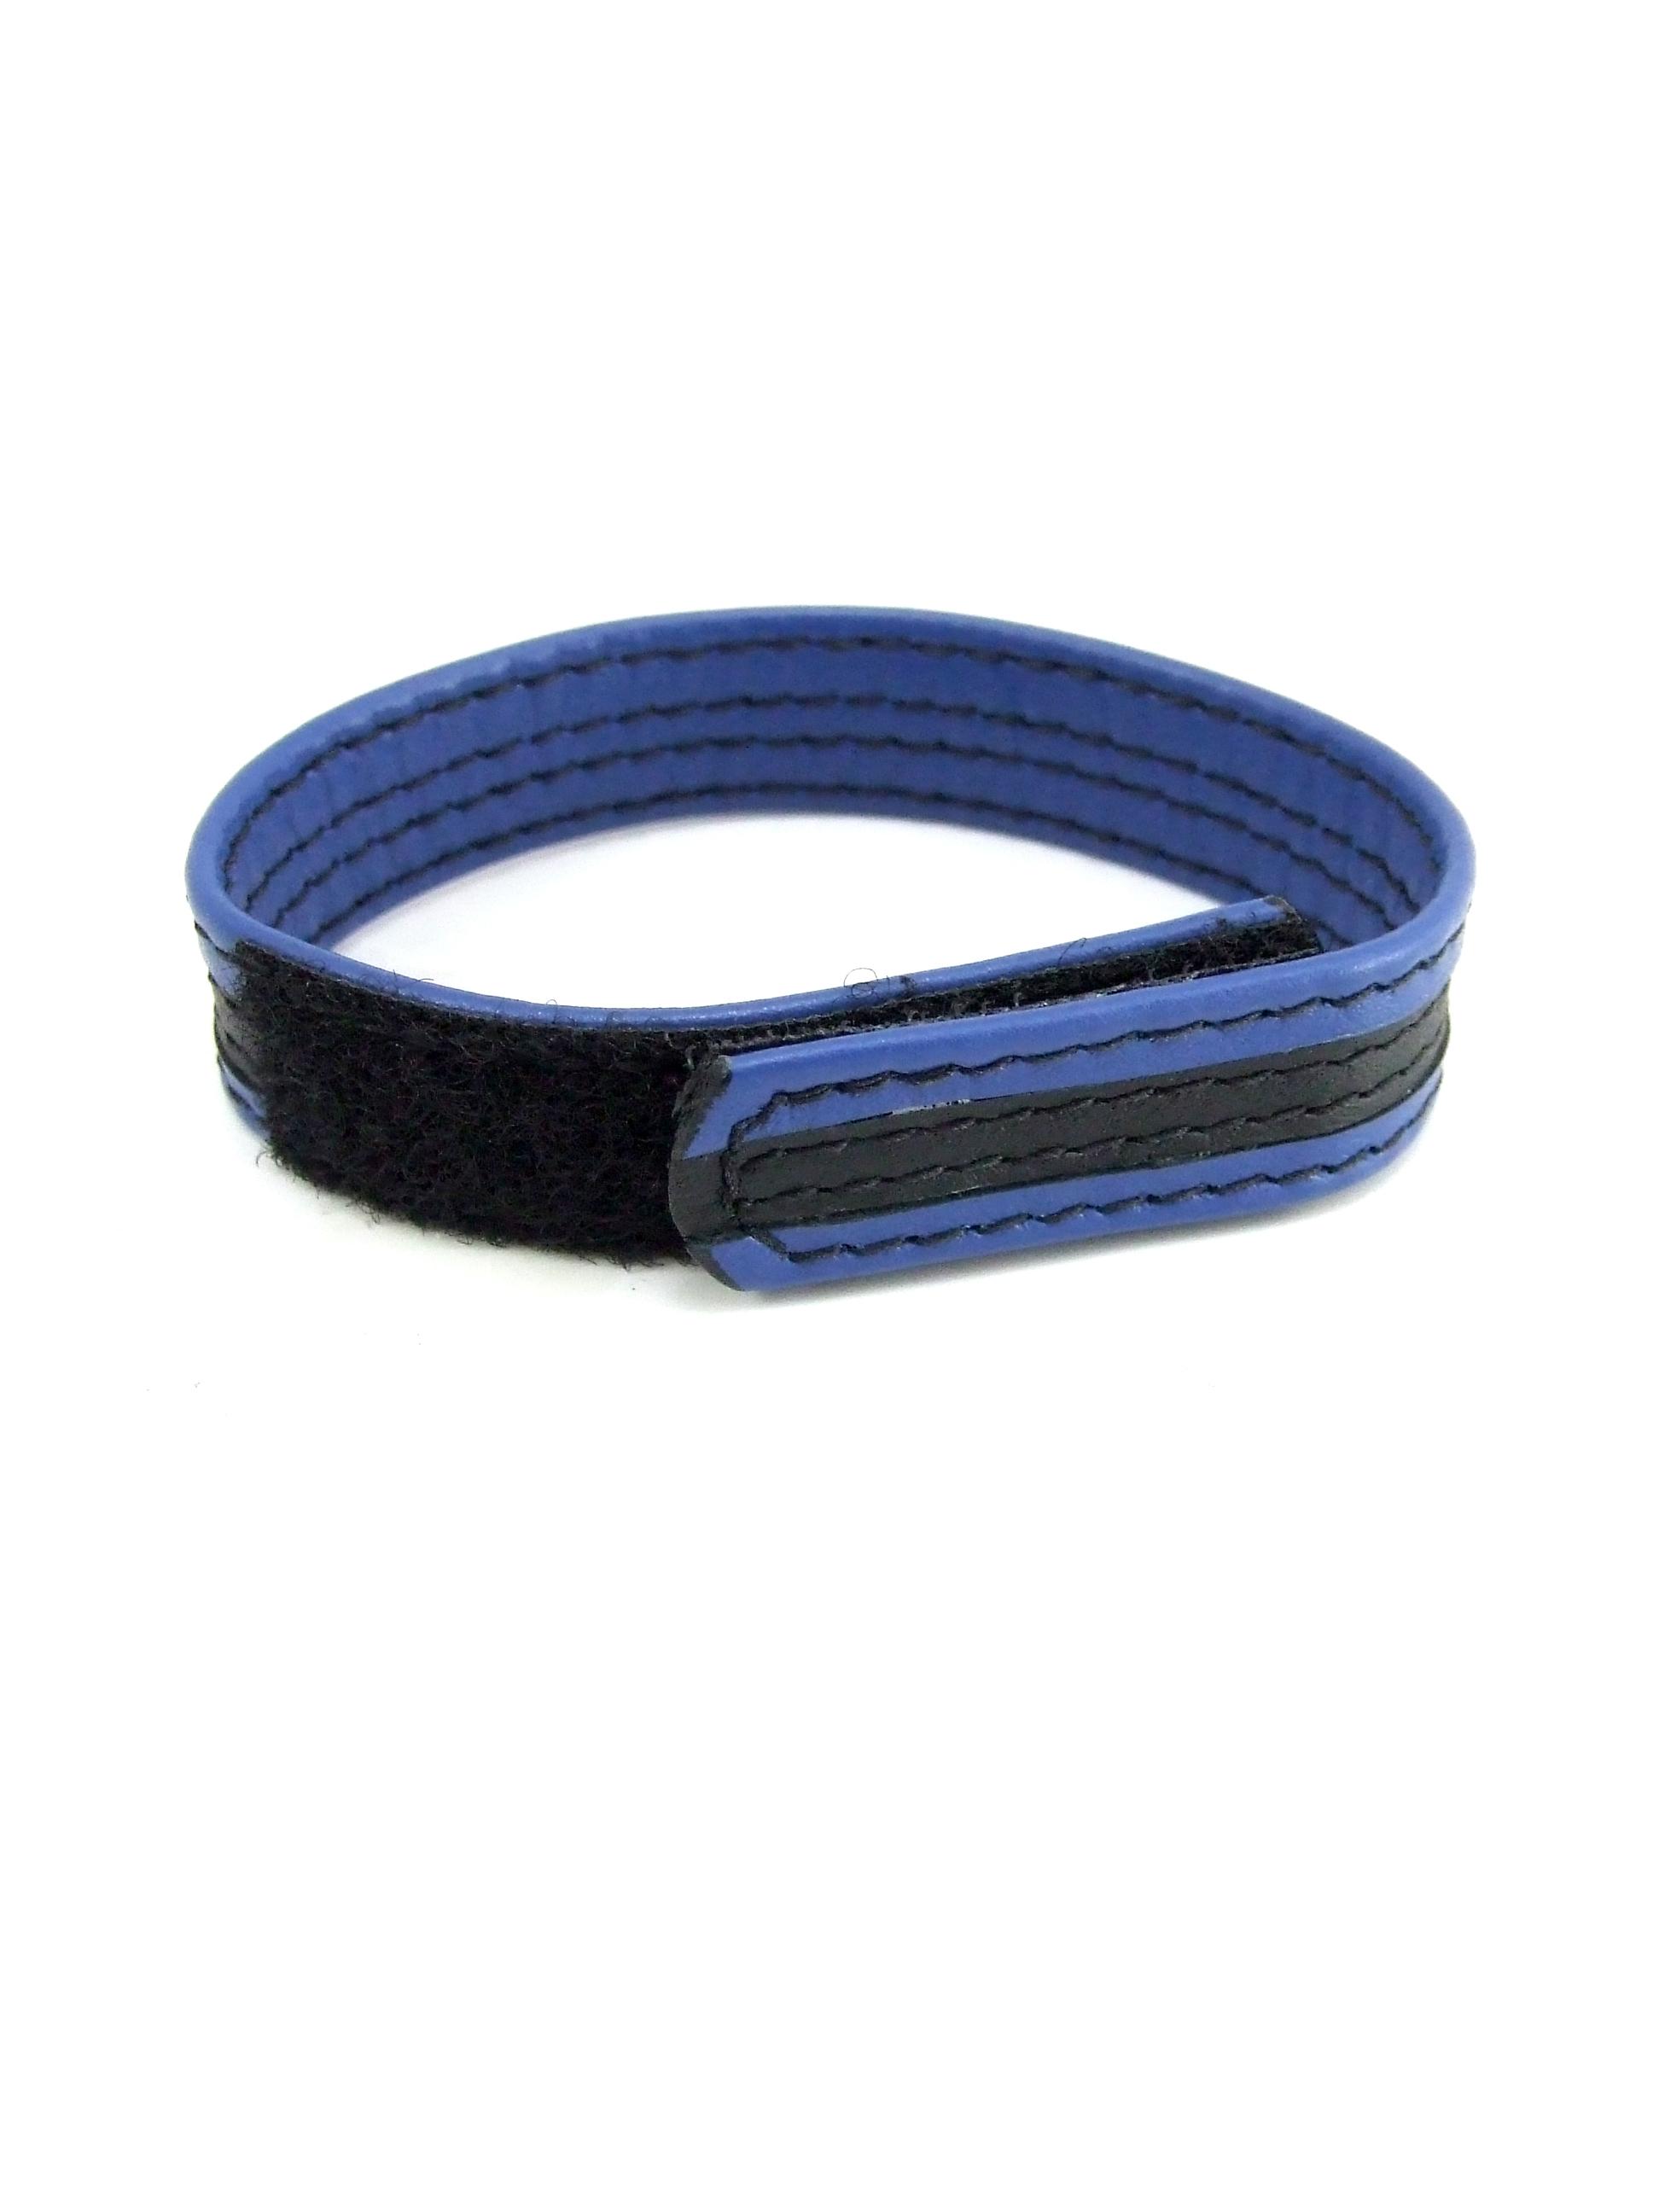 LEATHER VELCRO C RING BLACK/BLUE